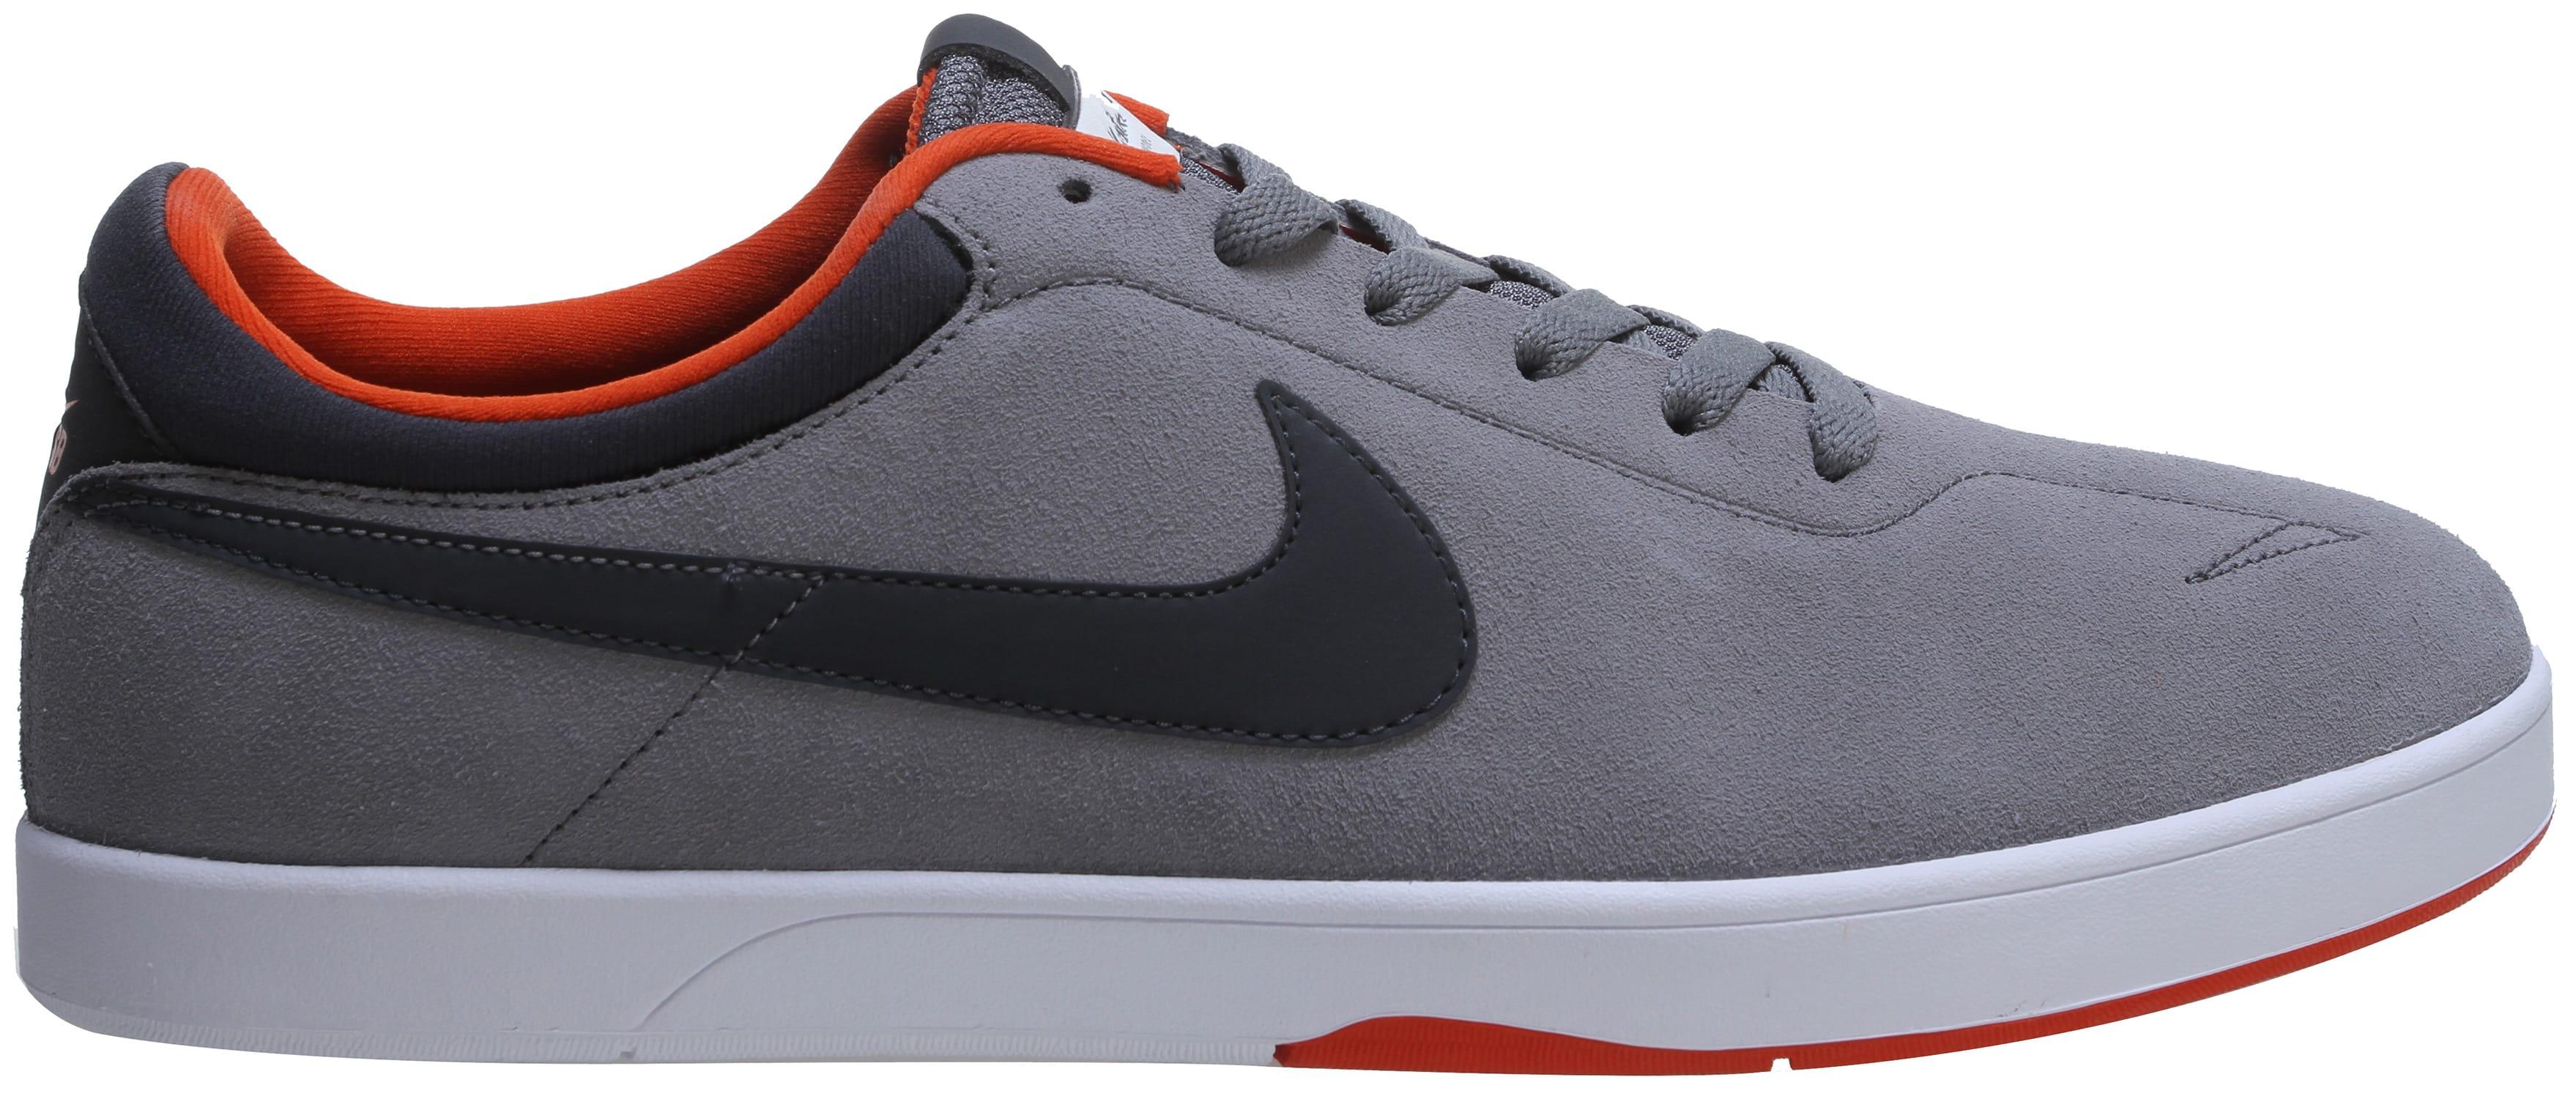 dbb7f4656e6ae Nike Air Zoom Eric Koston Skate Shoes - thumbnail 1